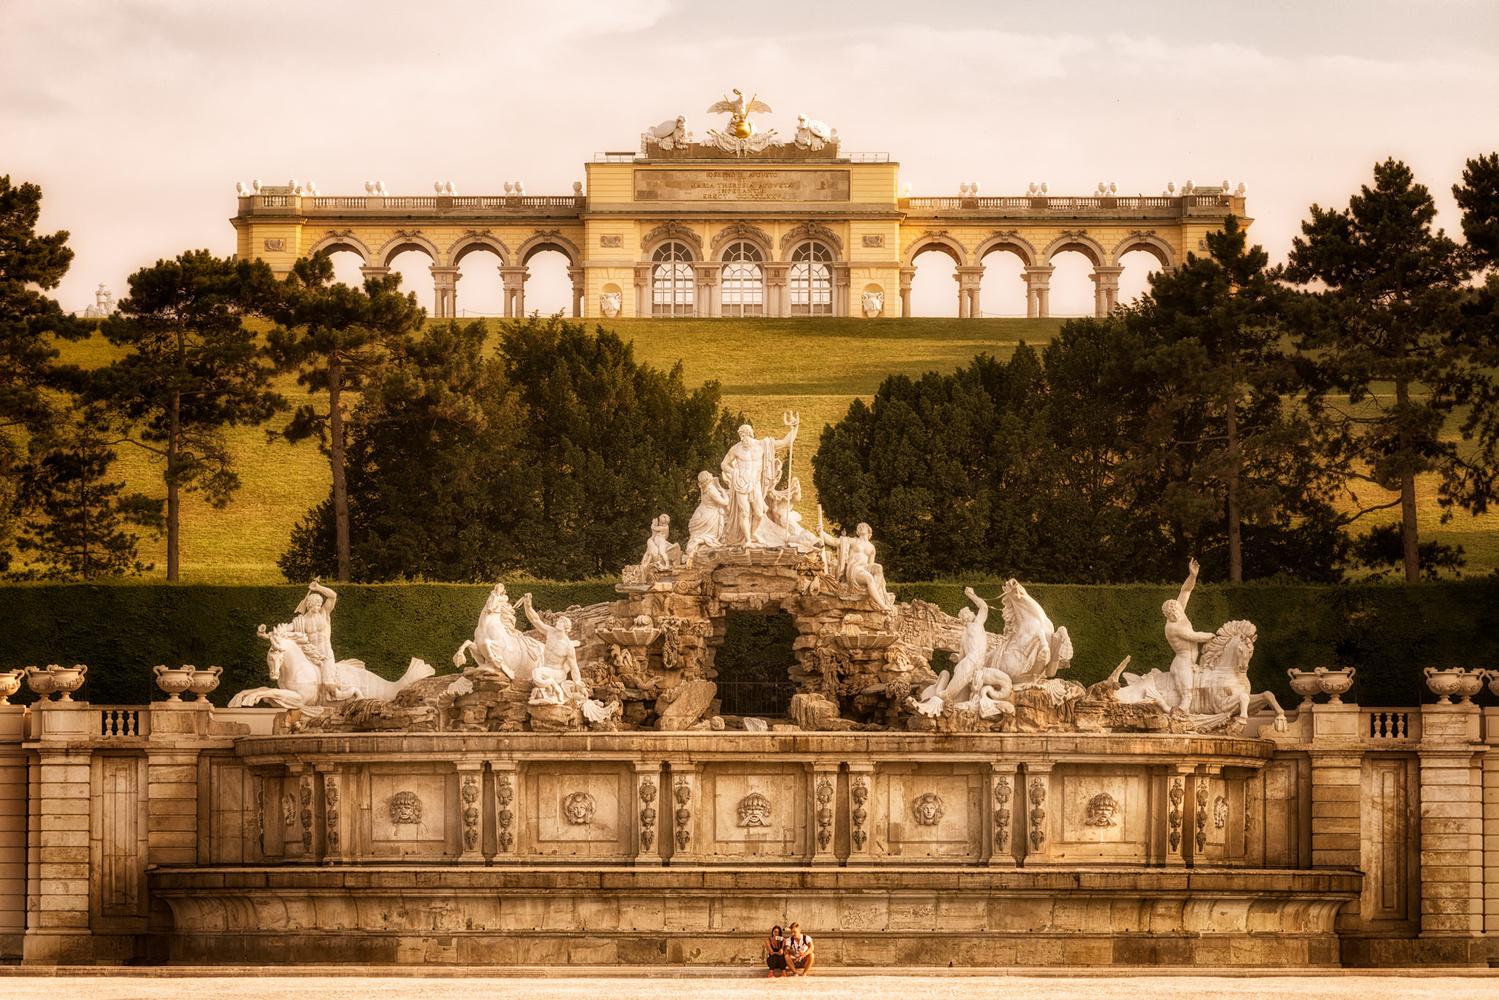 The Gloriette and The Neptune Fountain   Vienna, Austria by Nico Trinkhaus